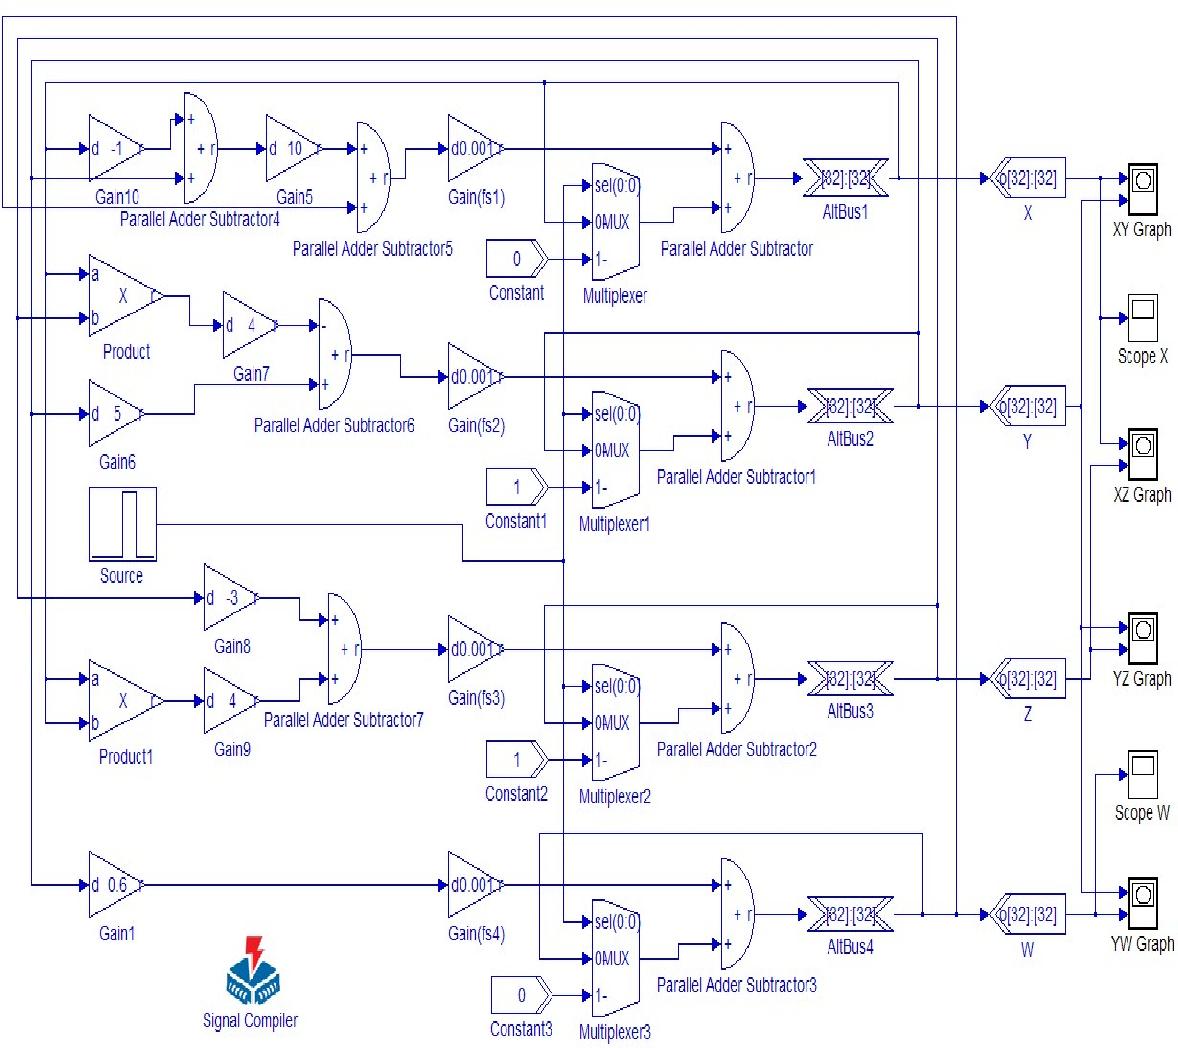 Hyper-chaotic LÜ System Simulation Design of Digital Circuit Based ...